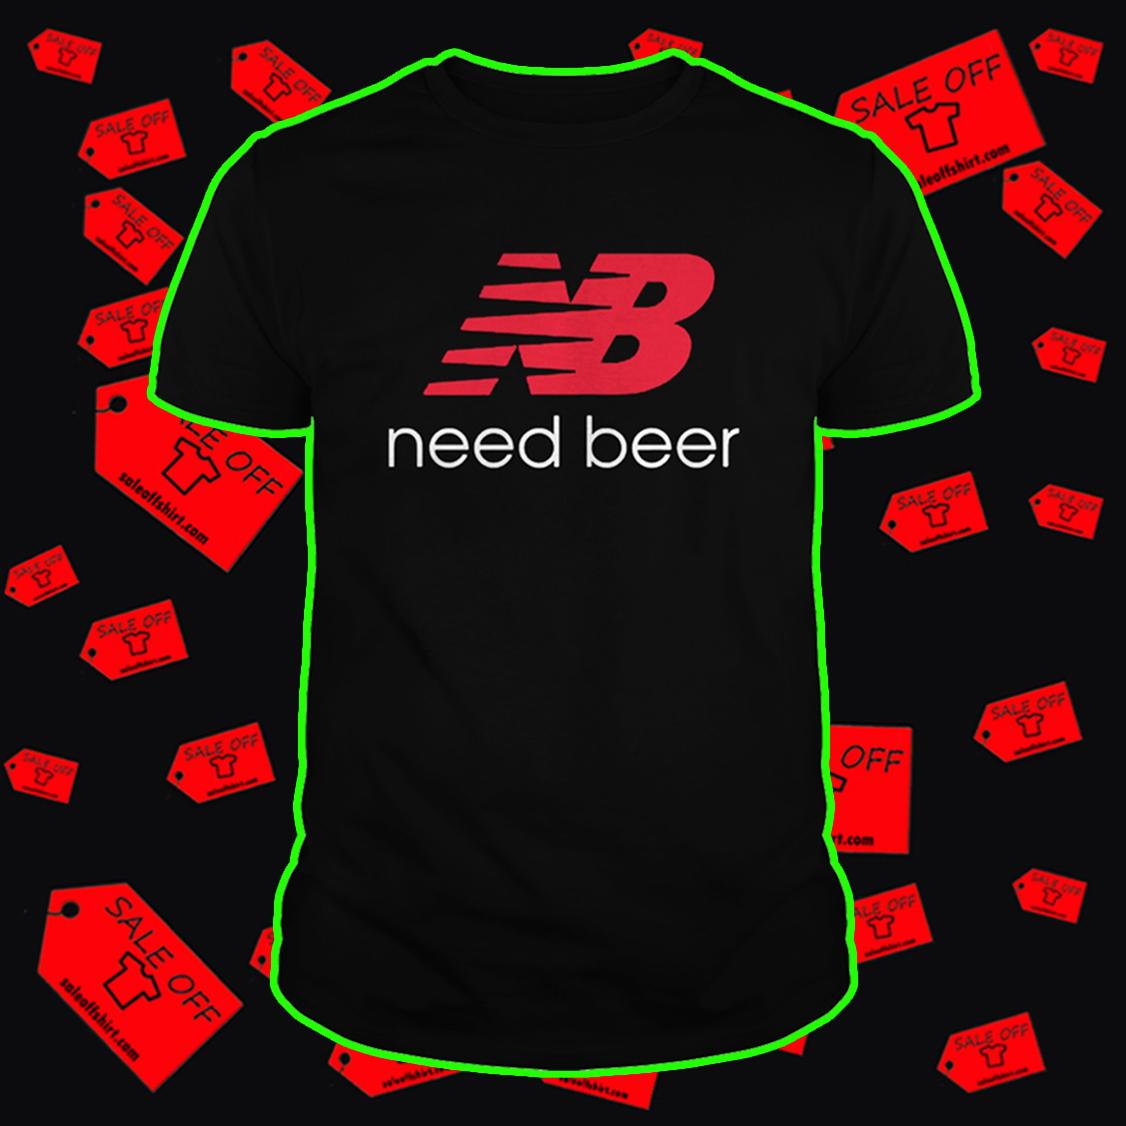 New Balance NB Need Beer shirt